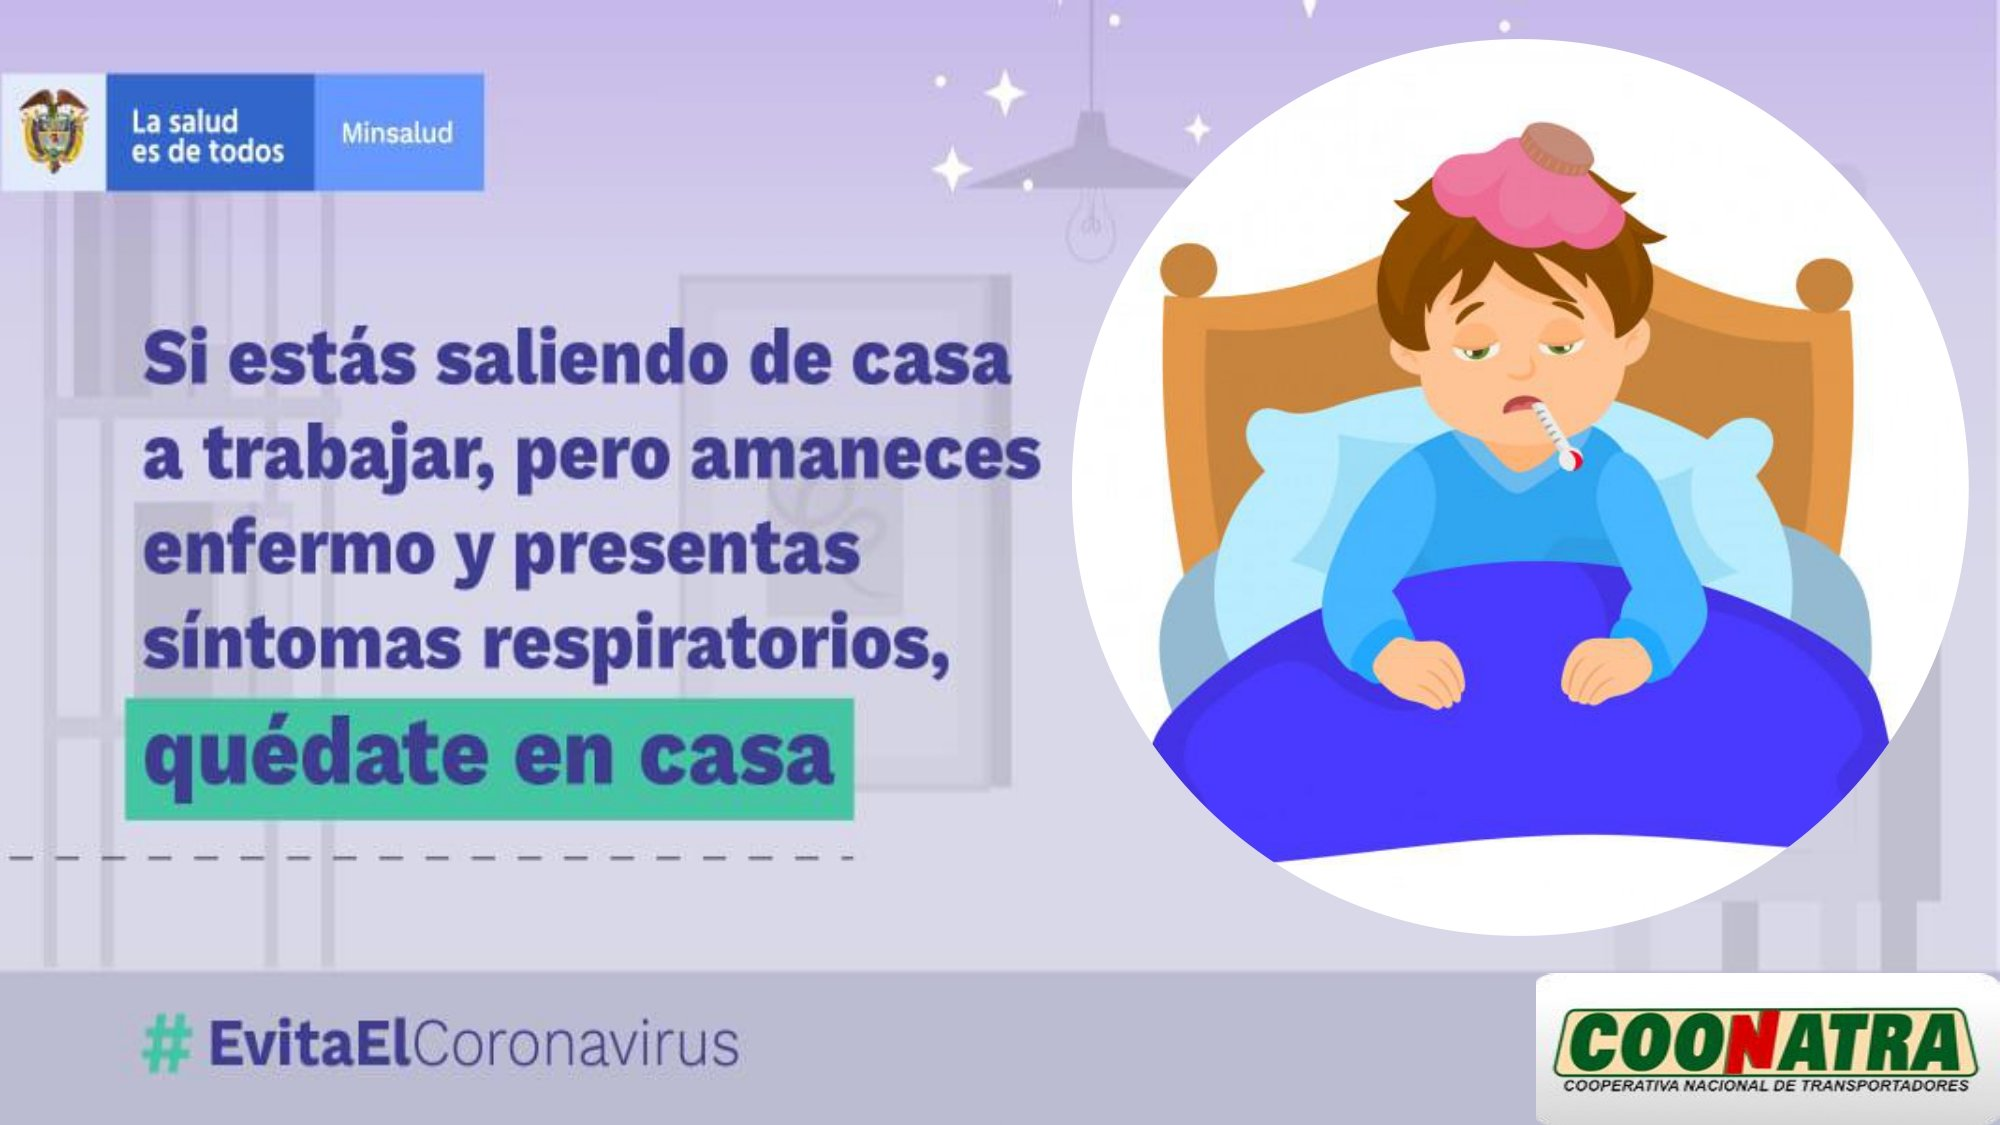 https://0201.nccdn.net/1_2/000/000/126/a01/quedate-en-casa-si-presentas-sintomas_page-0001.jpg